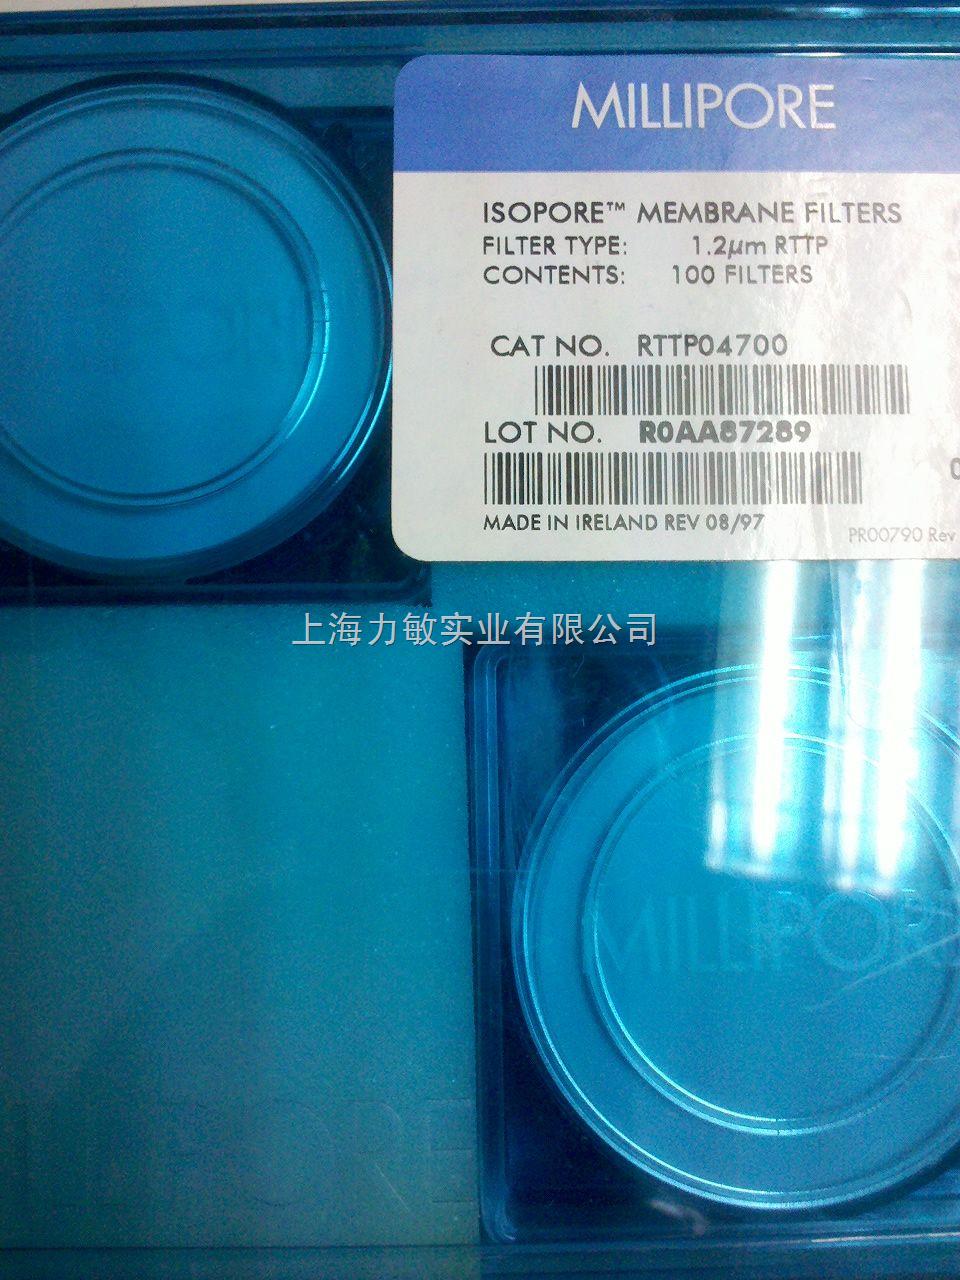 Millipore Isopore 表面滤膜聚碳酸酯rttp04700